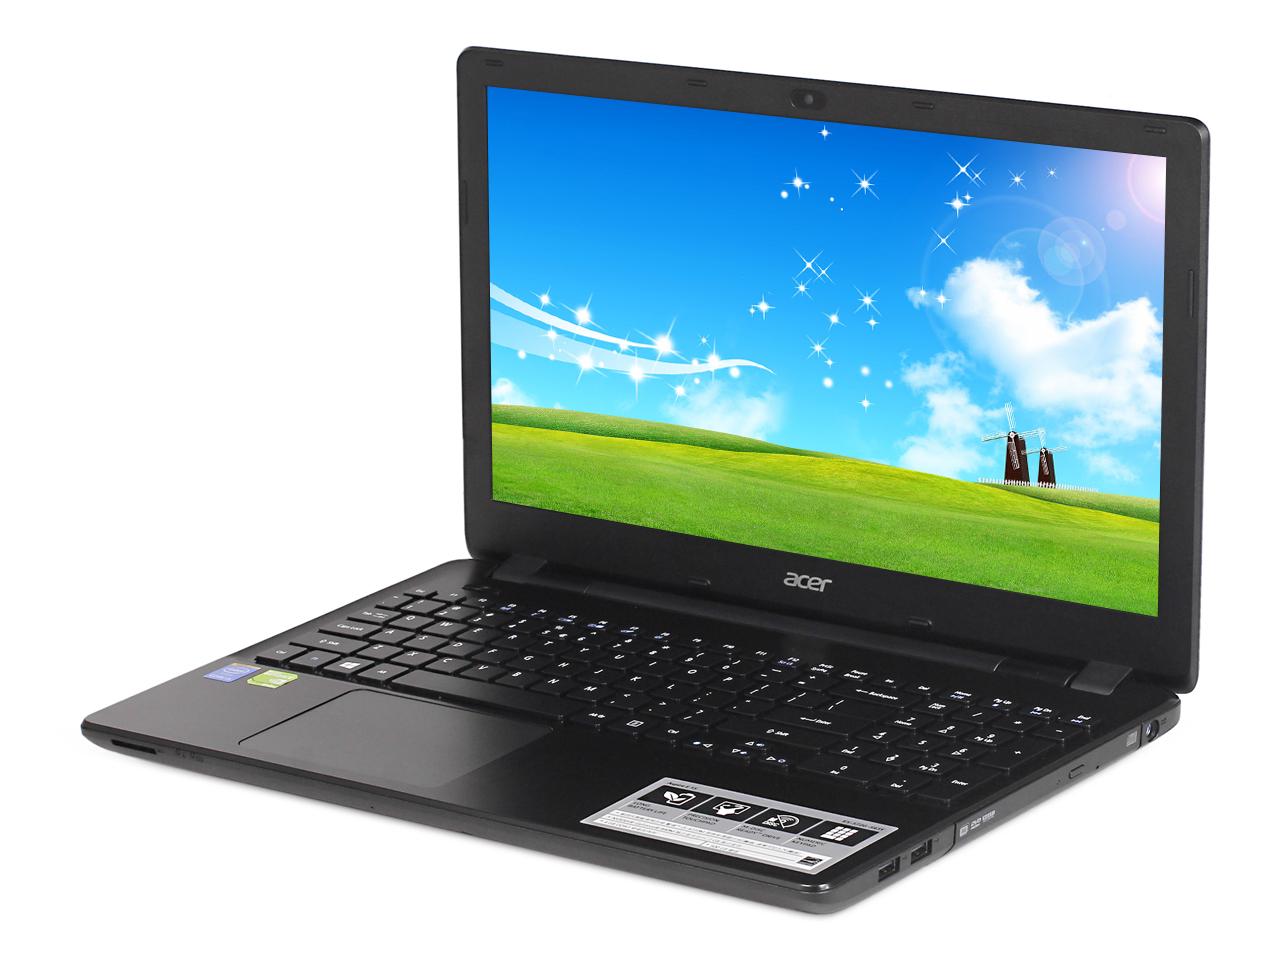 Acer E5-573G-73EL